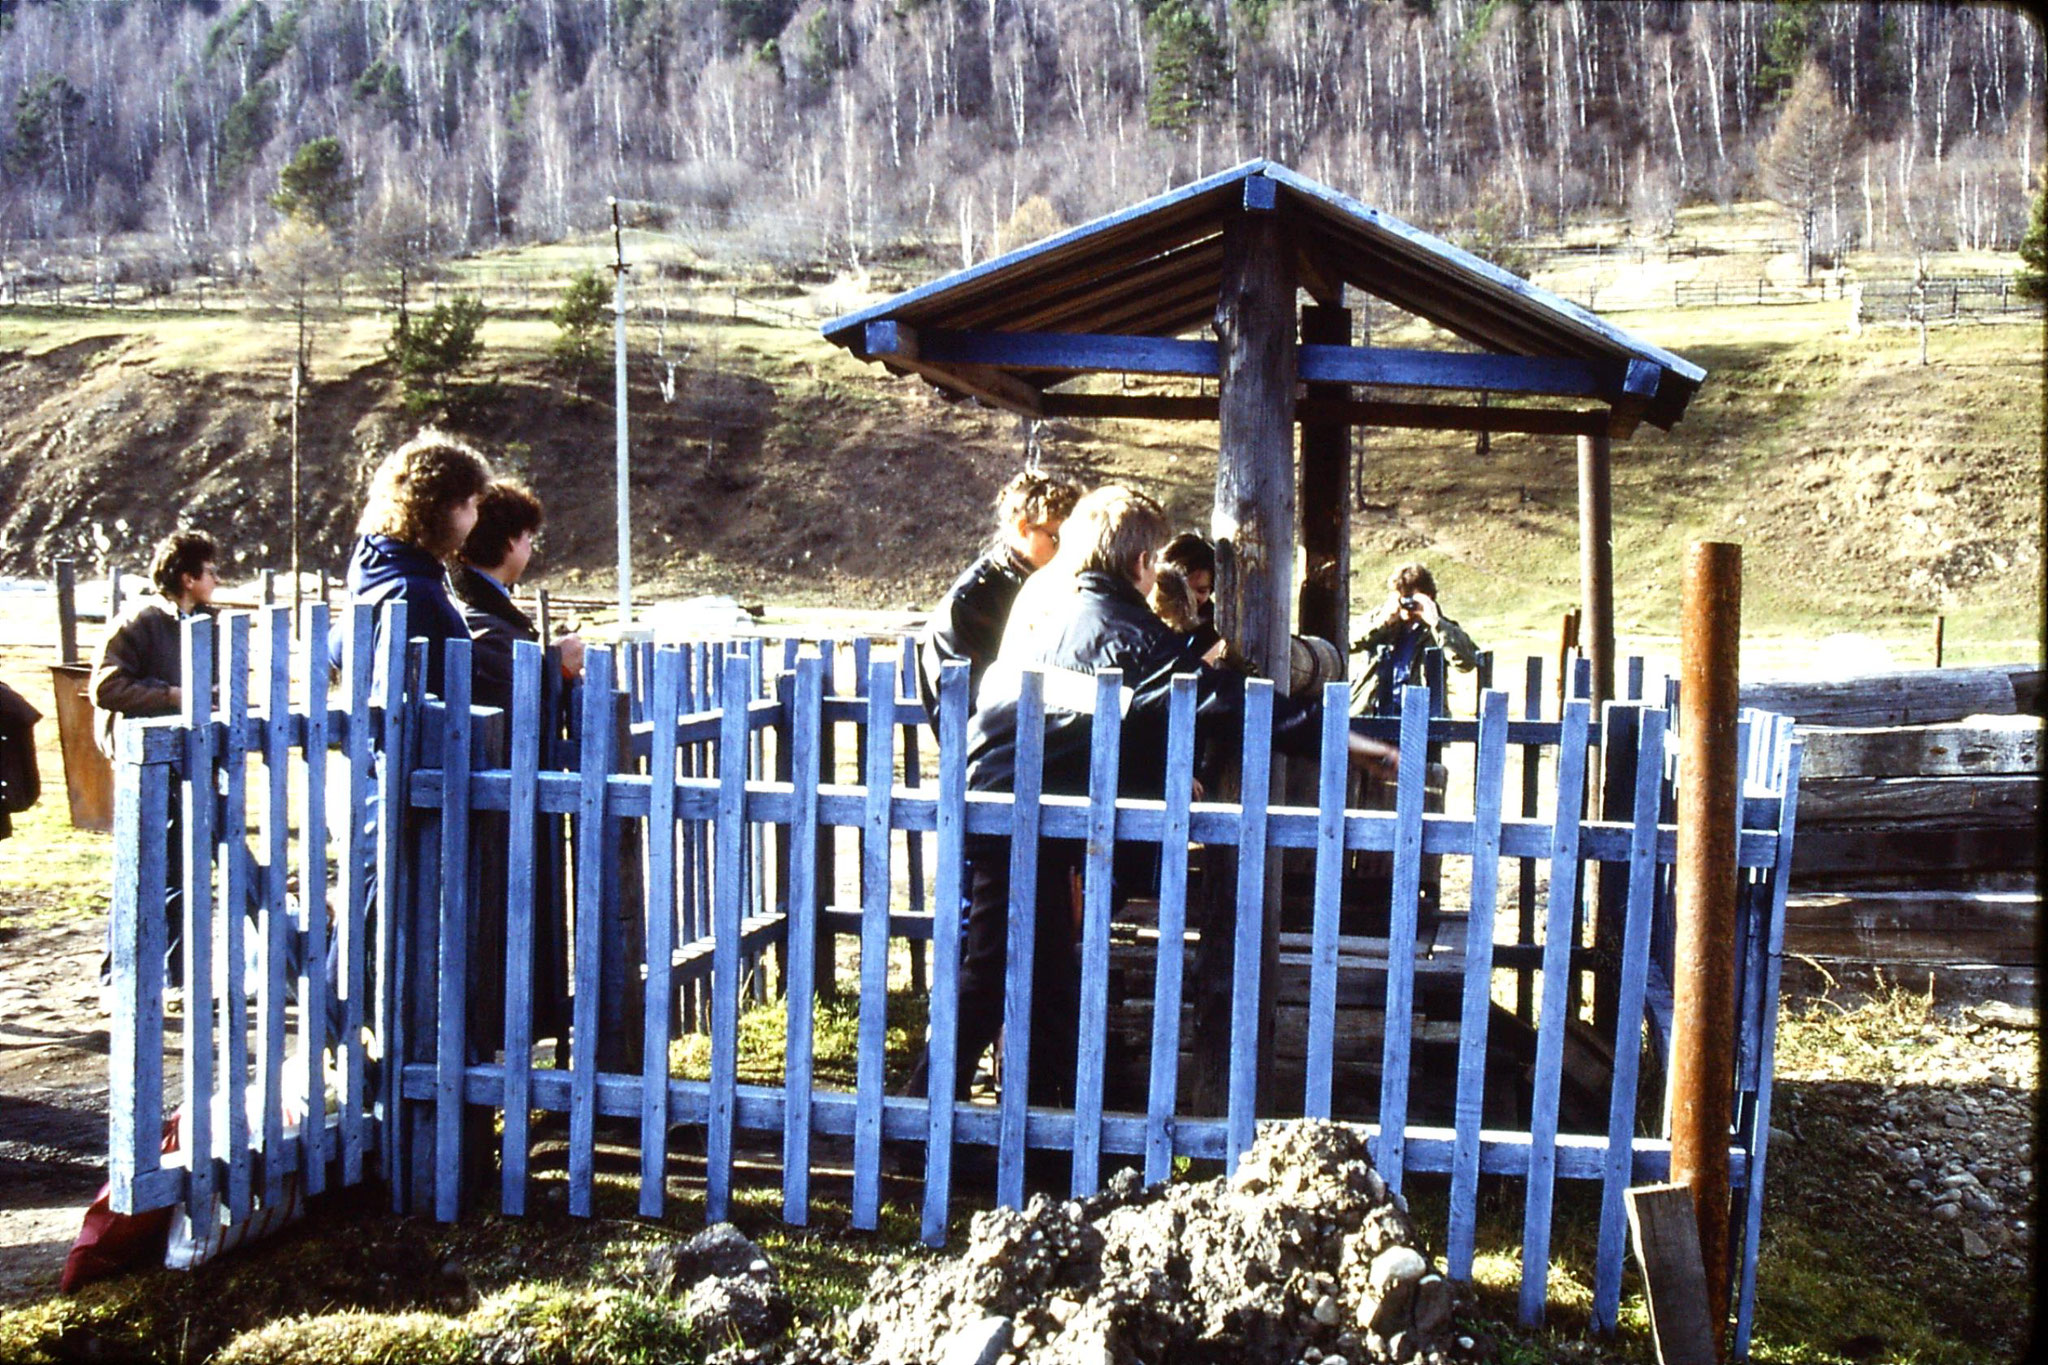 23/10/1988: 31: Lake Baikal Listvyanka well